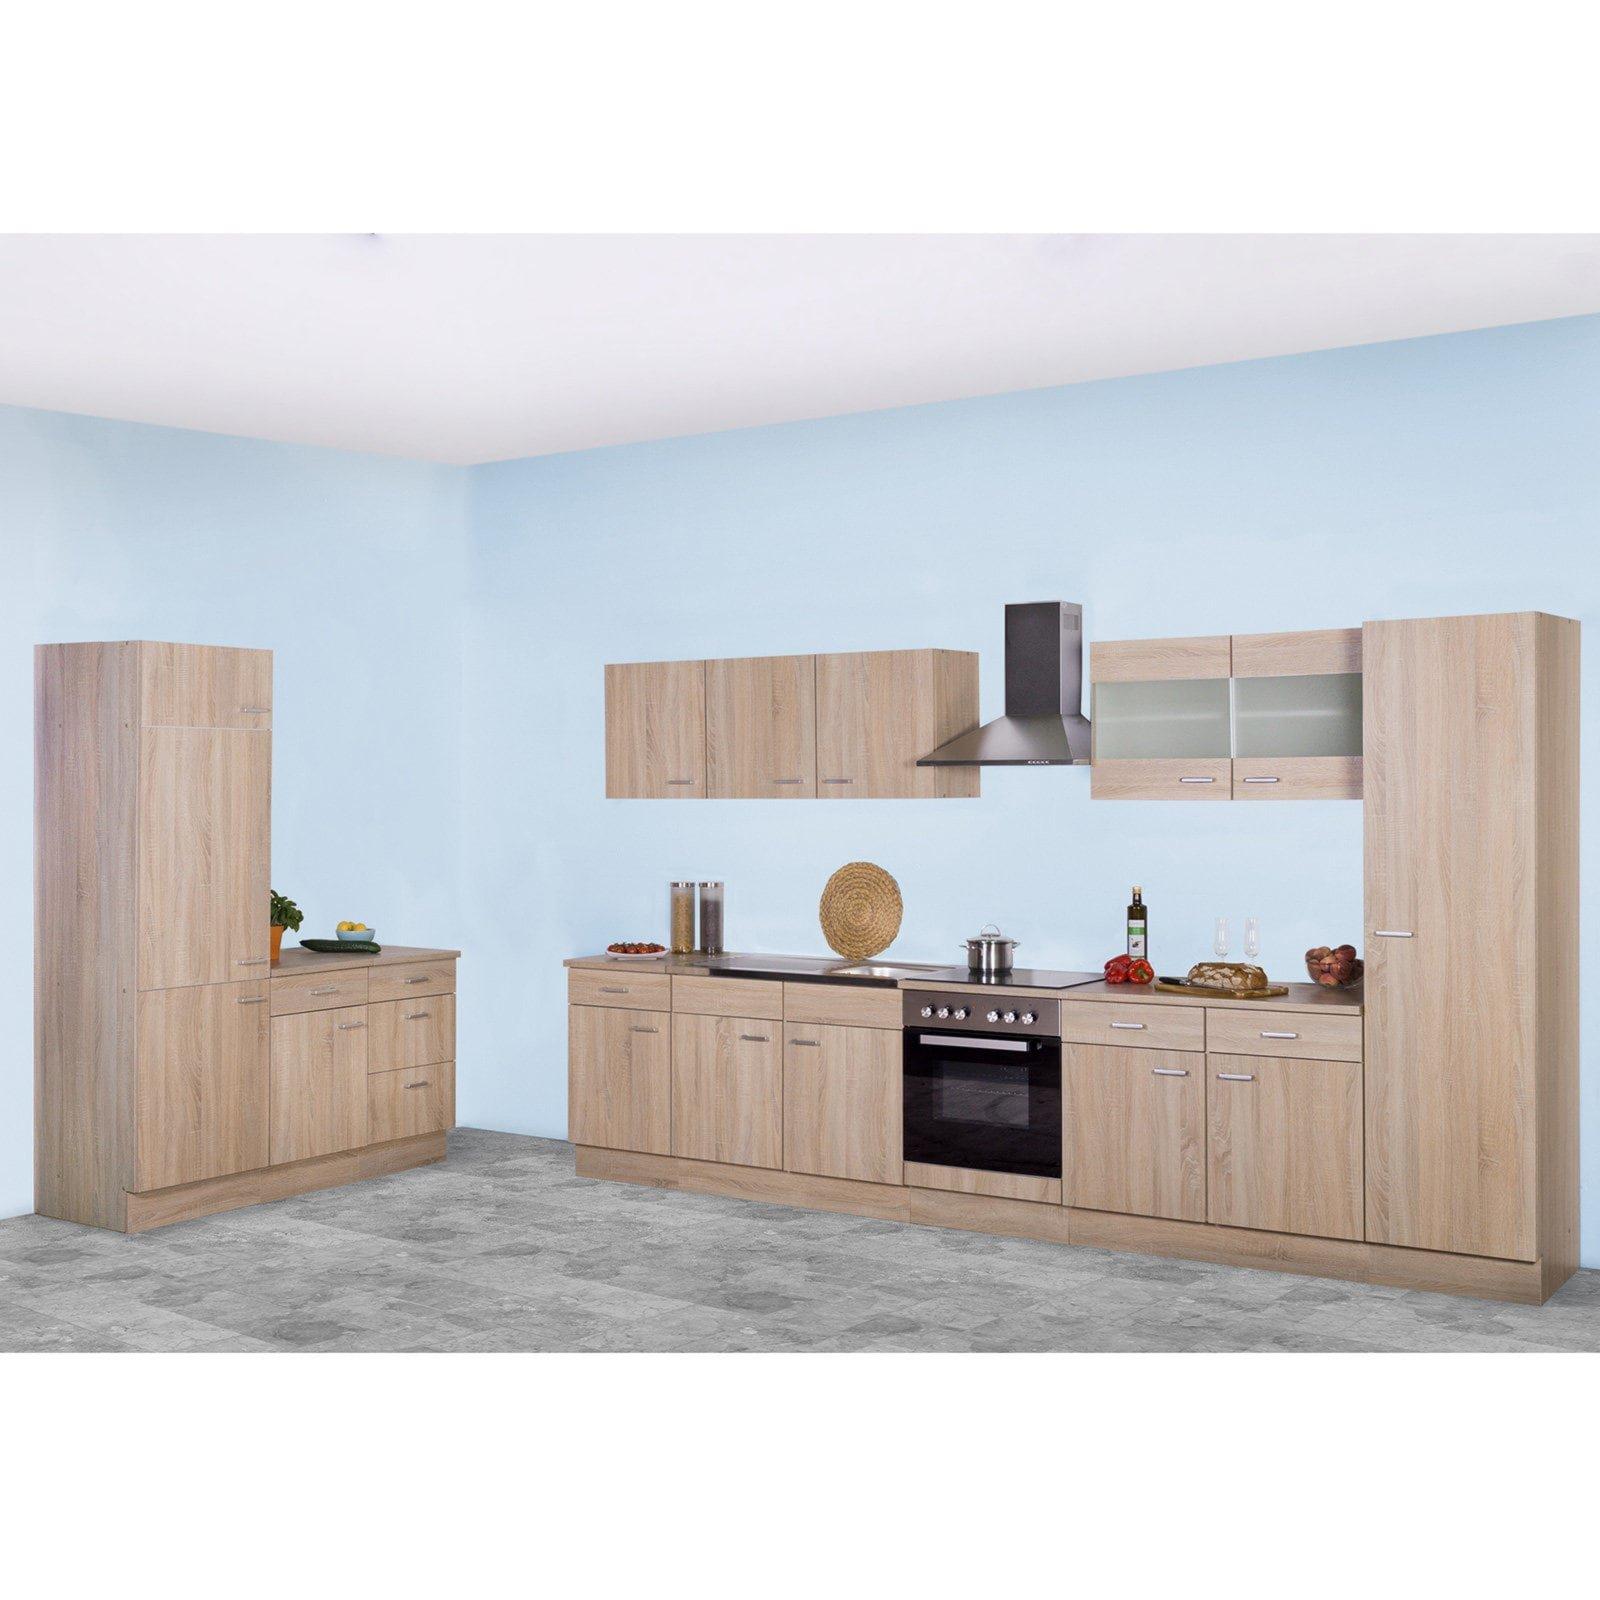 topfschrank sinja sonoma eiche 50 cm ebay. Black Bedroom Furniture Sets. Home Design Ideas